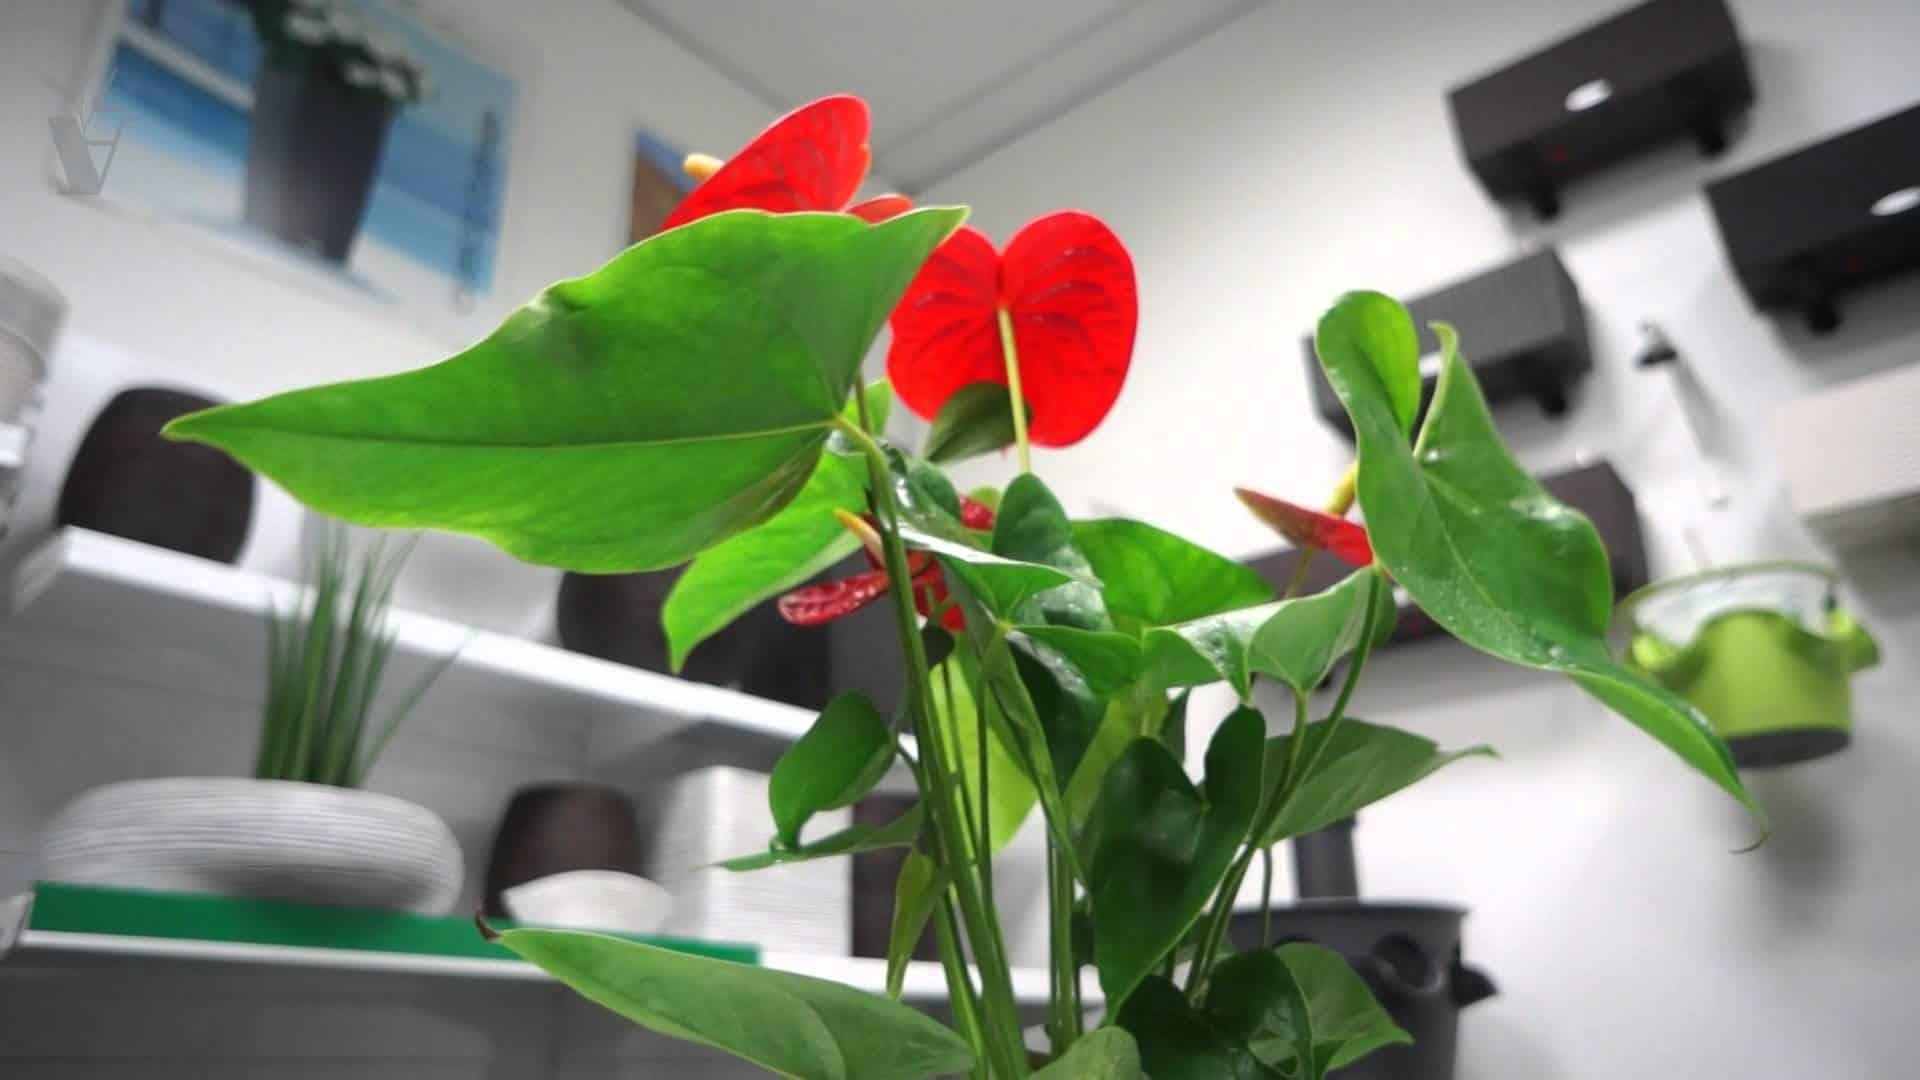 Антуриум домашний - фото, уход, условия выращивания, размножение